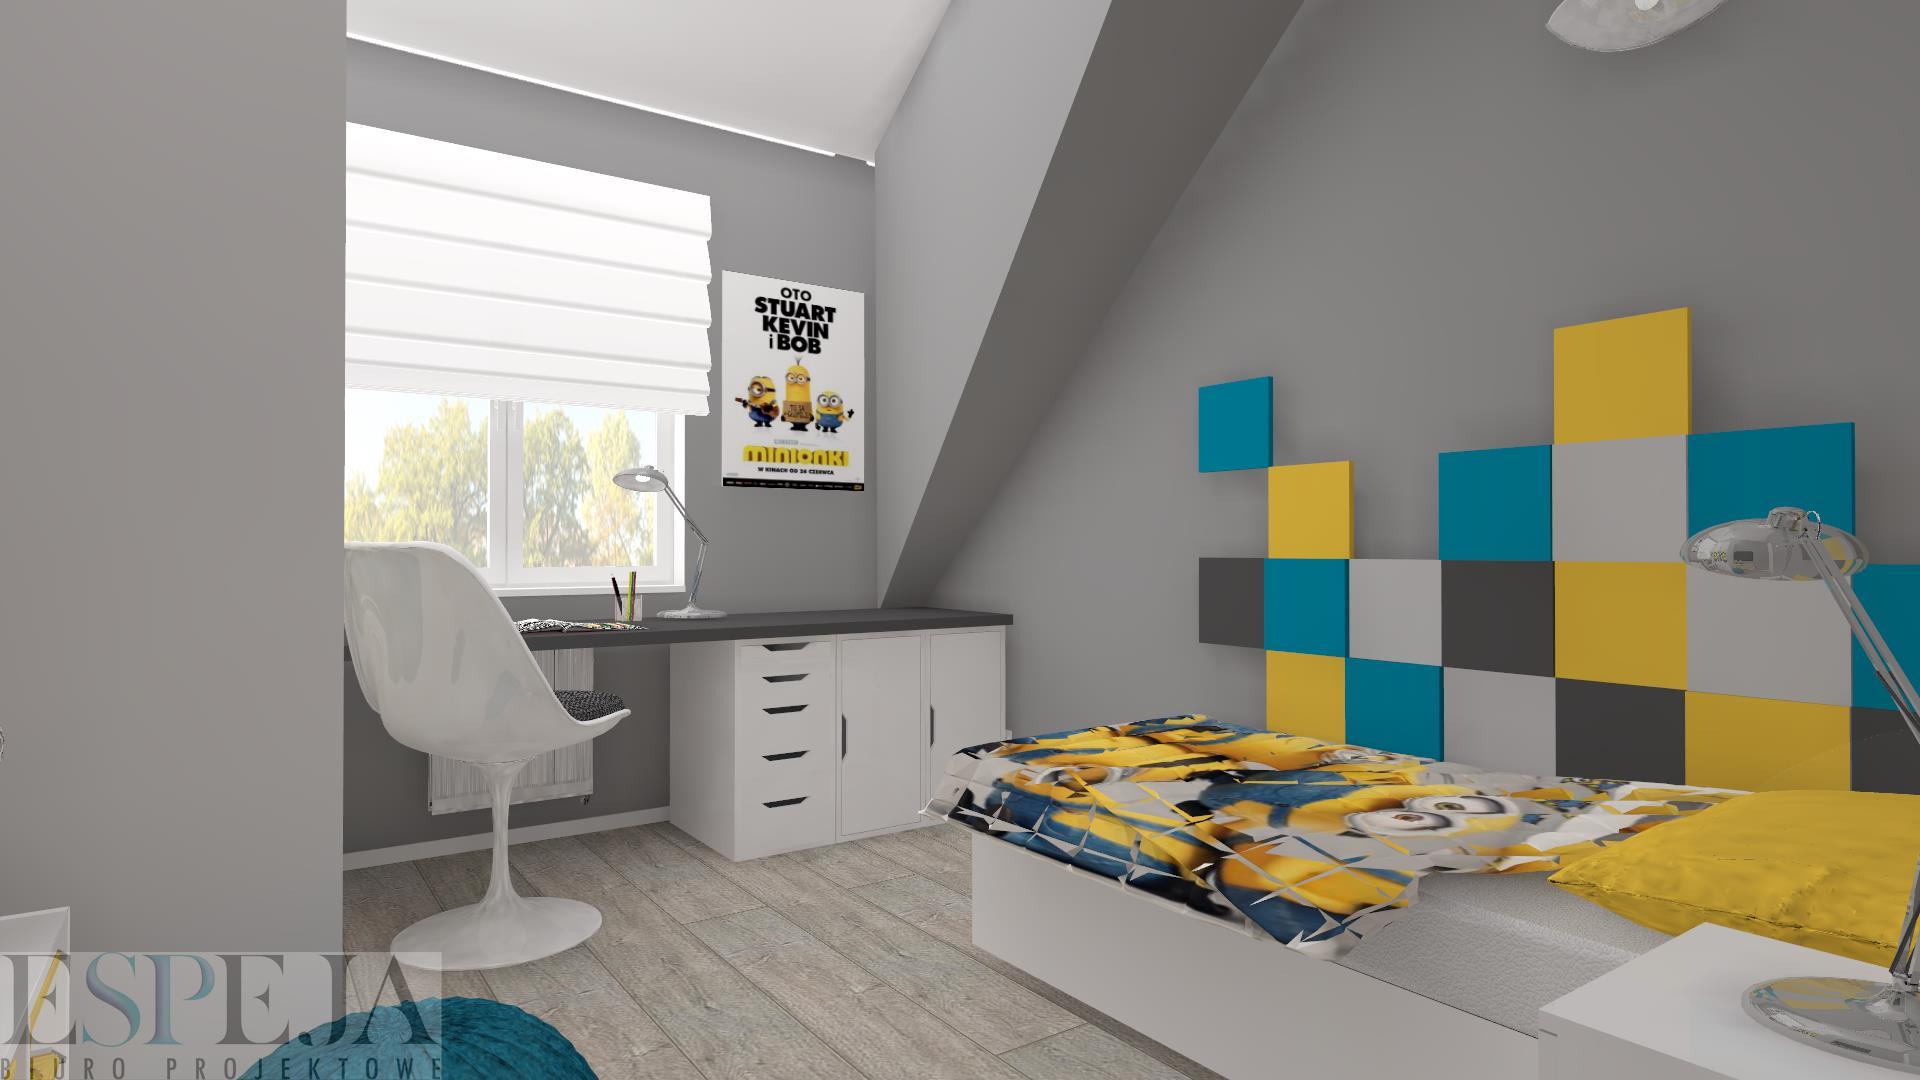 w ski pok j dla ch opca najlepsze pomys y na wystr j domu i inspiracje meblami. Black Bedroom Furniture Sets. Home Design Ideas